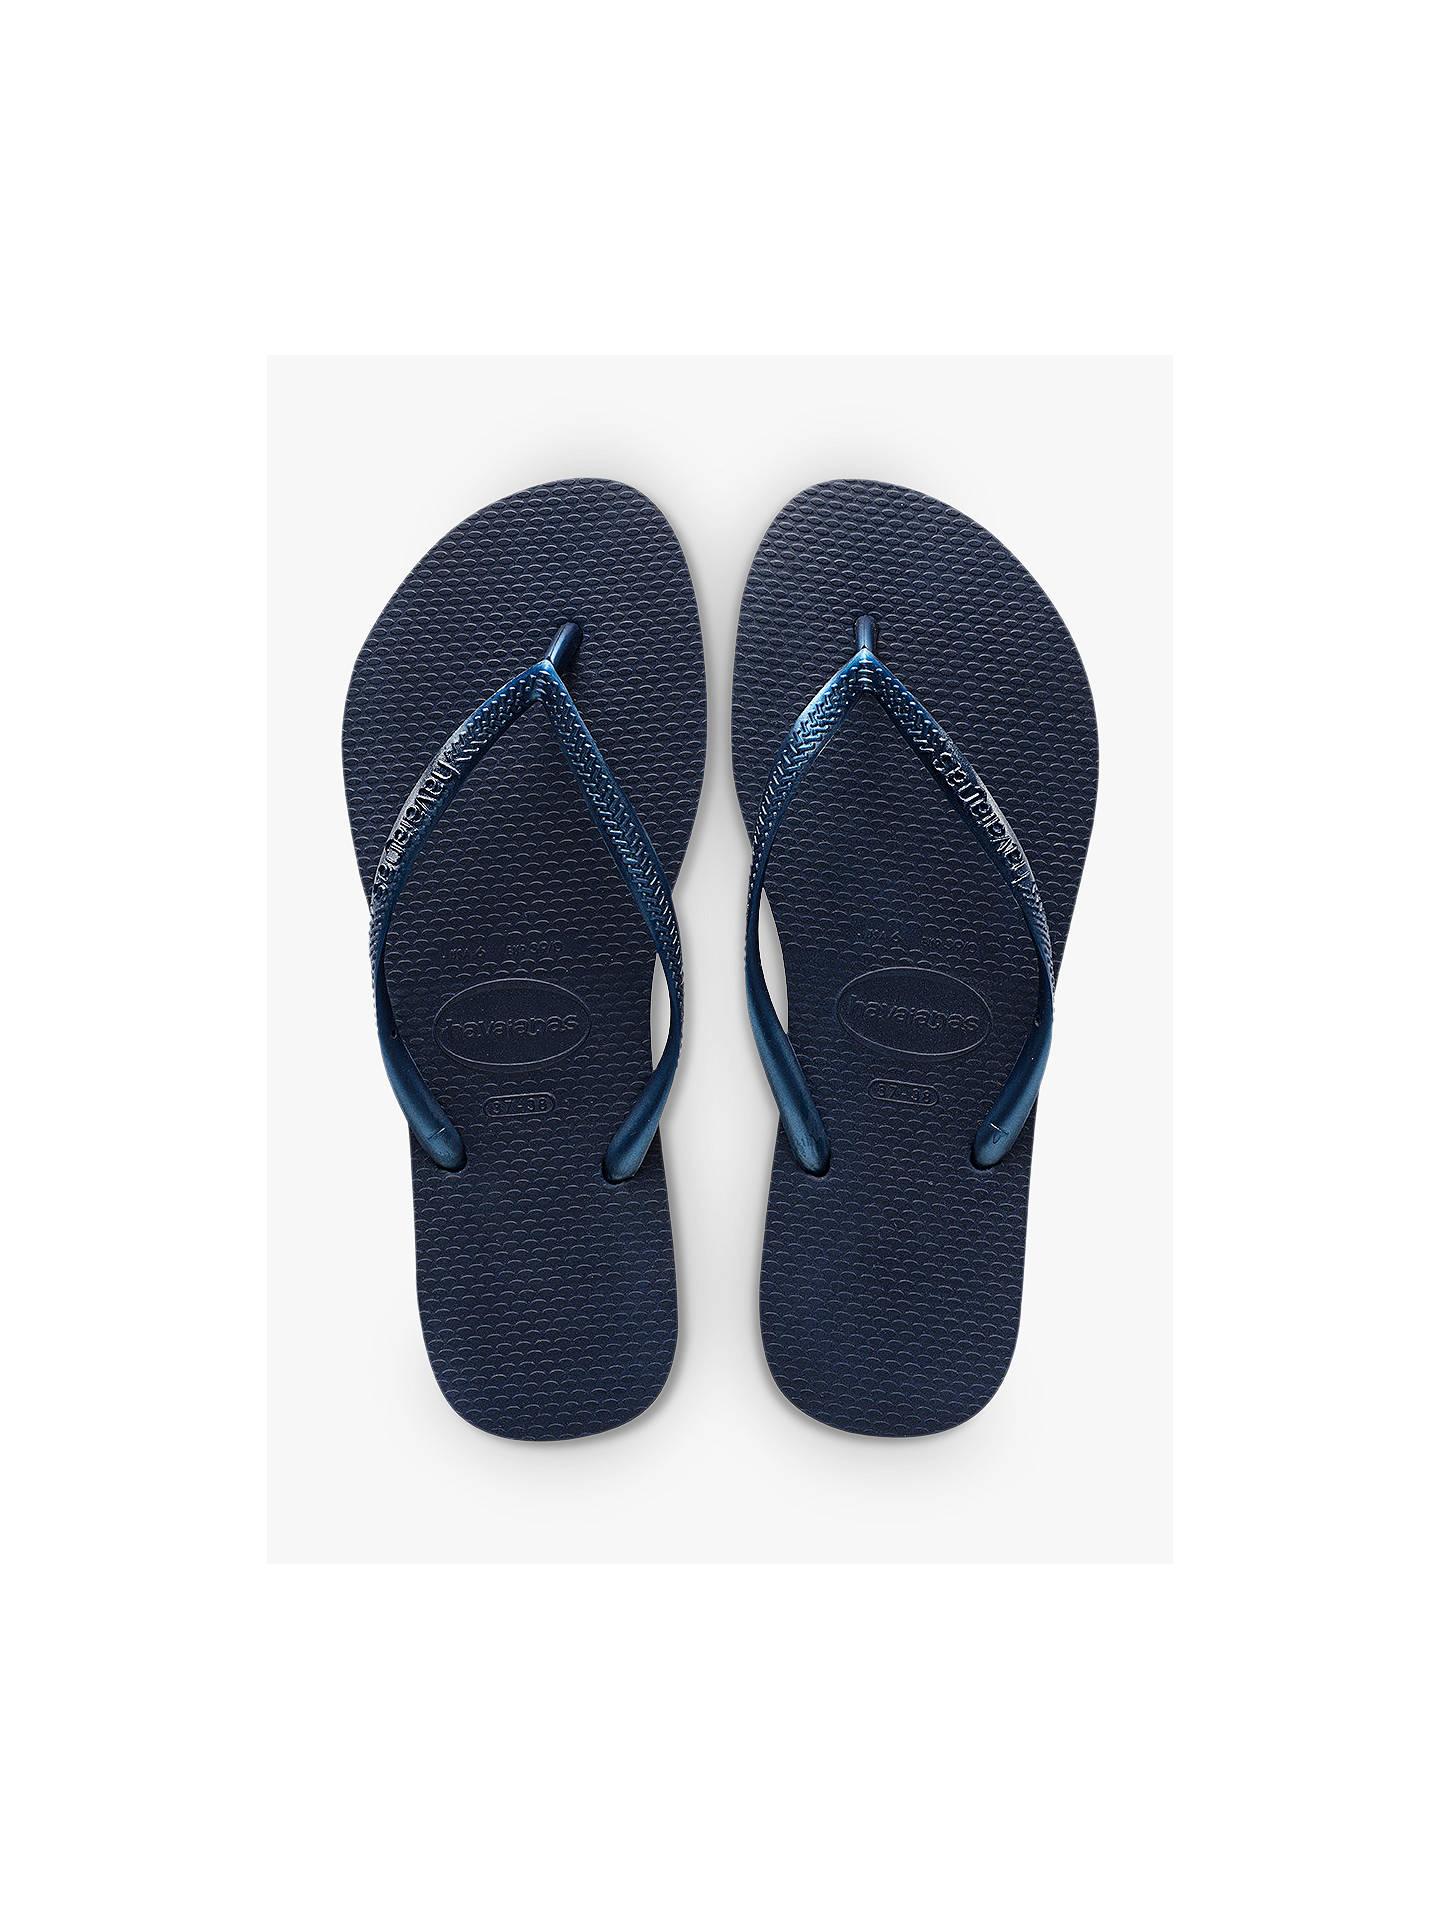 a3a8814fe Havaianas Slim Flip Flops at John Lewis   Partners